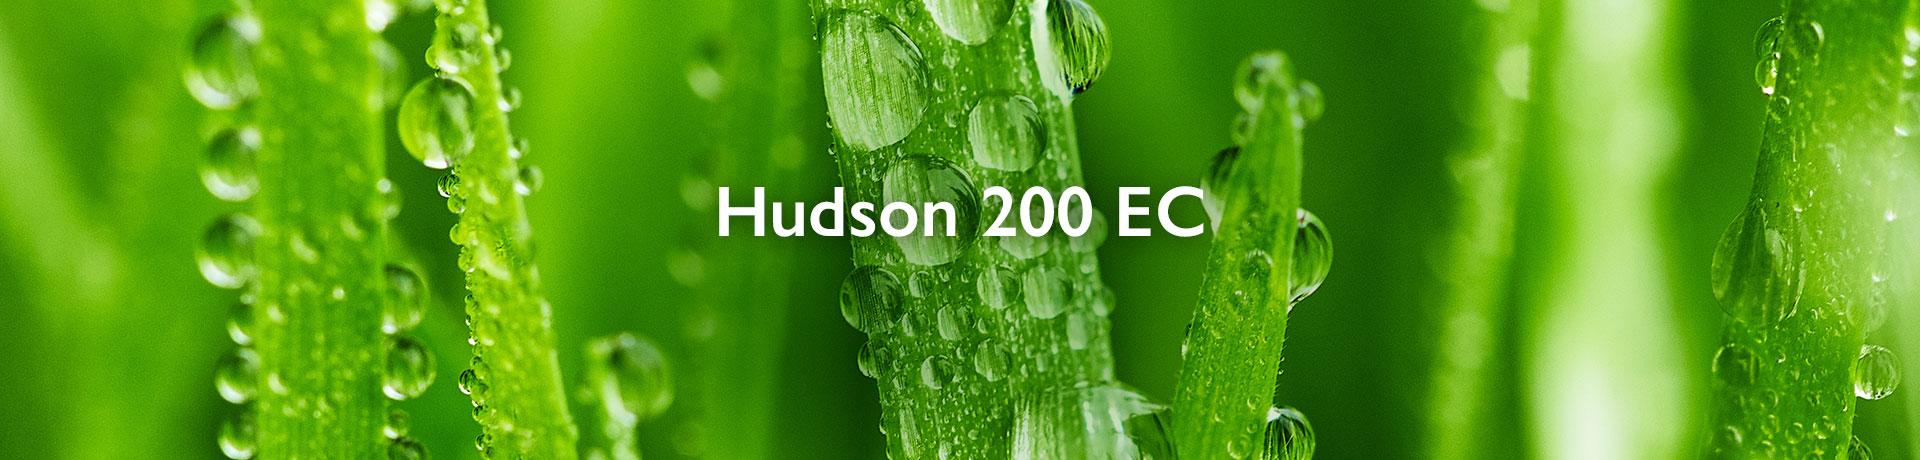 hudson 200 ec